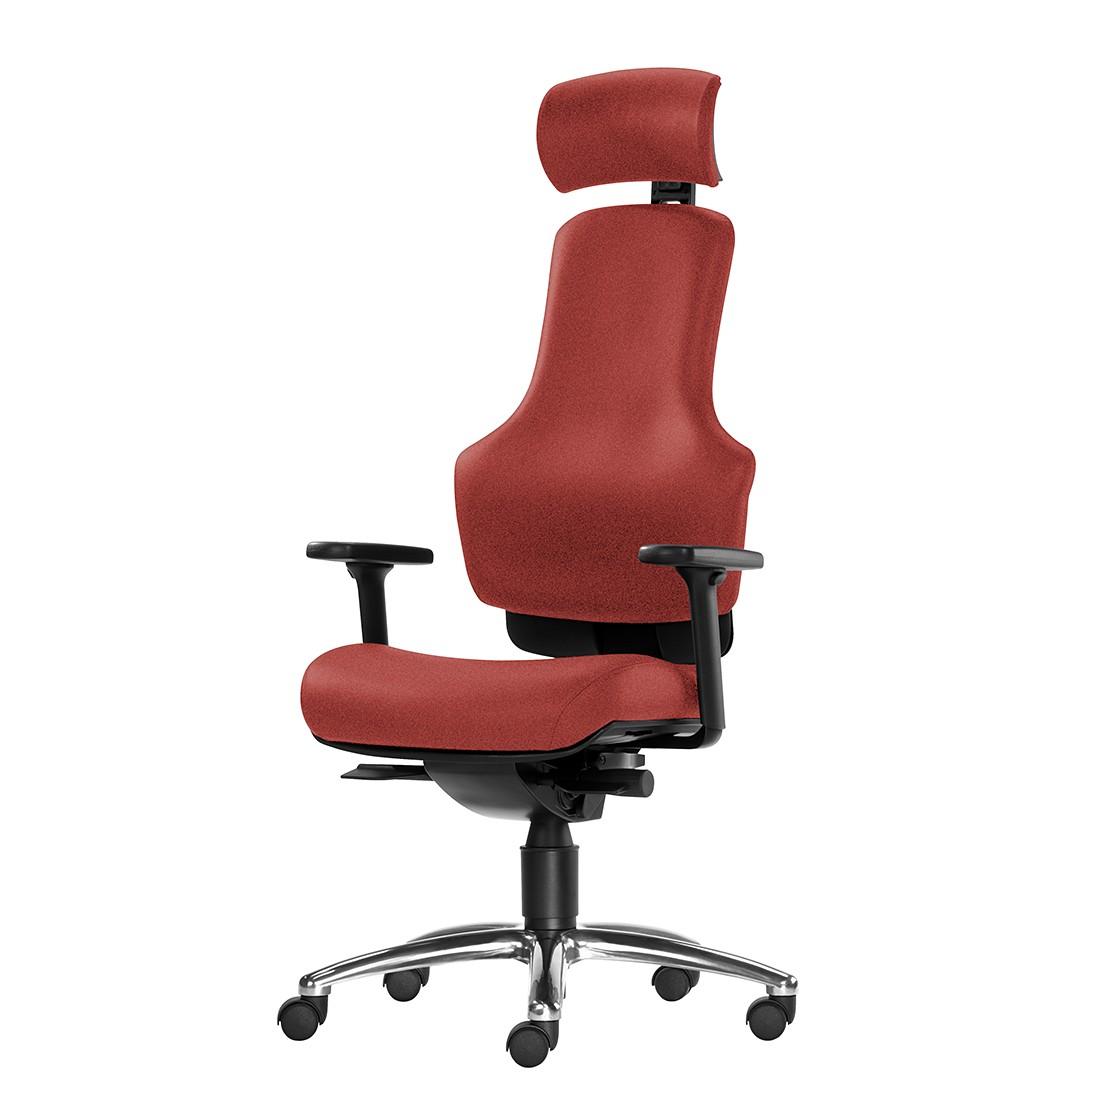 Bürodrehstuhl Ortholetic Balance I – Mit Kopfstütze – Bordeaux, 1000 Stühle Gernot-M. Steifensand günstig